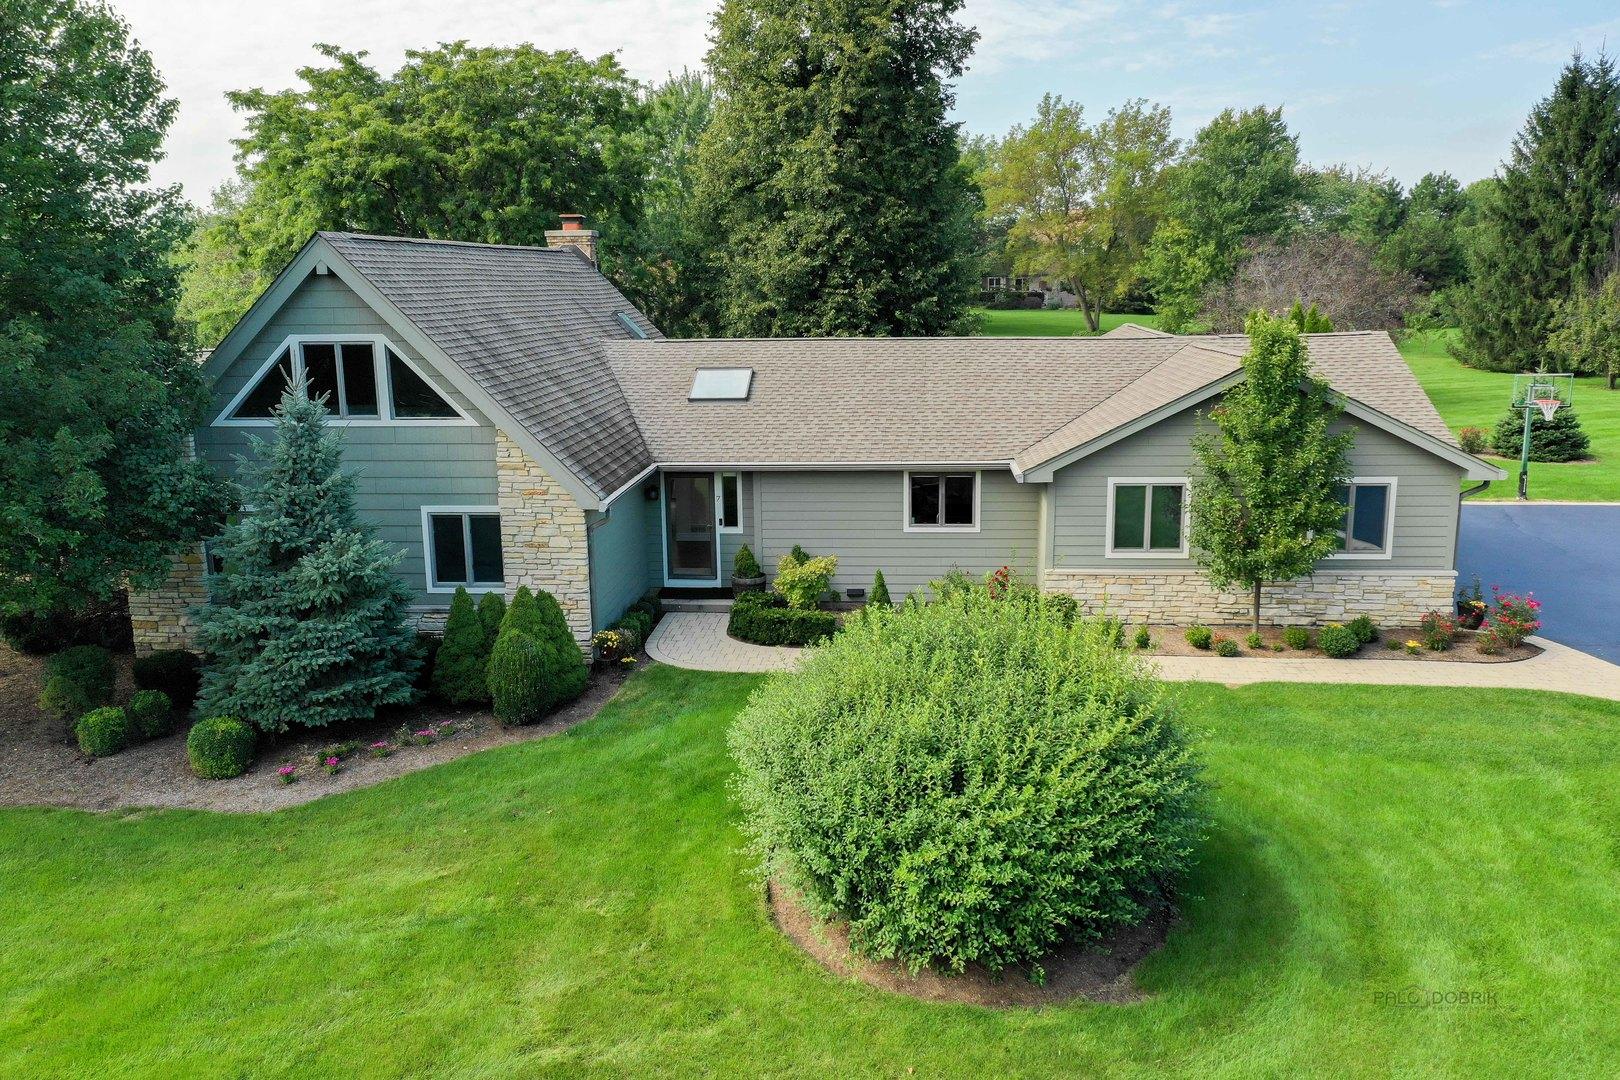 7 Lake View Road, Hawthorn Woods, Illinois 60047